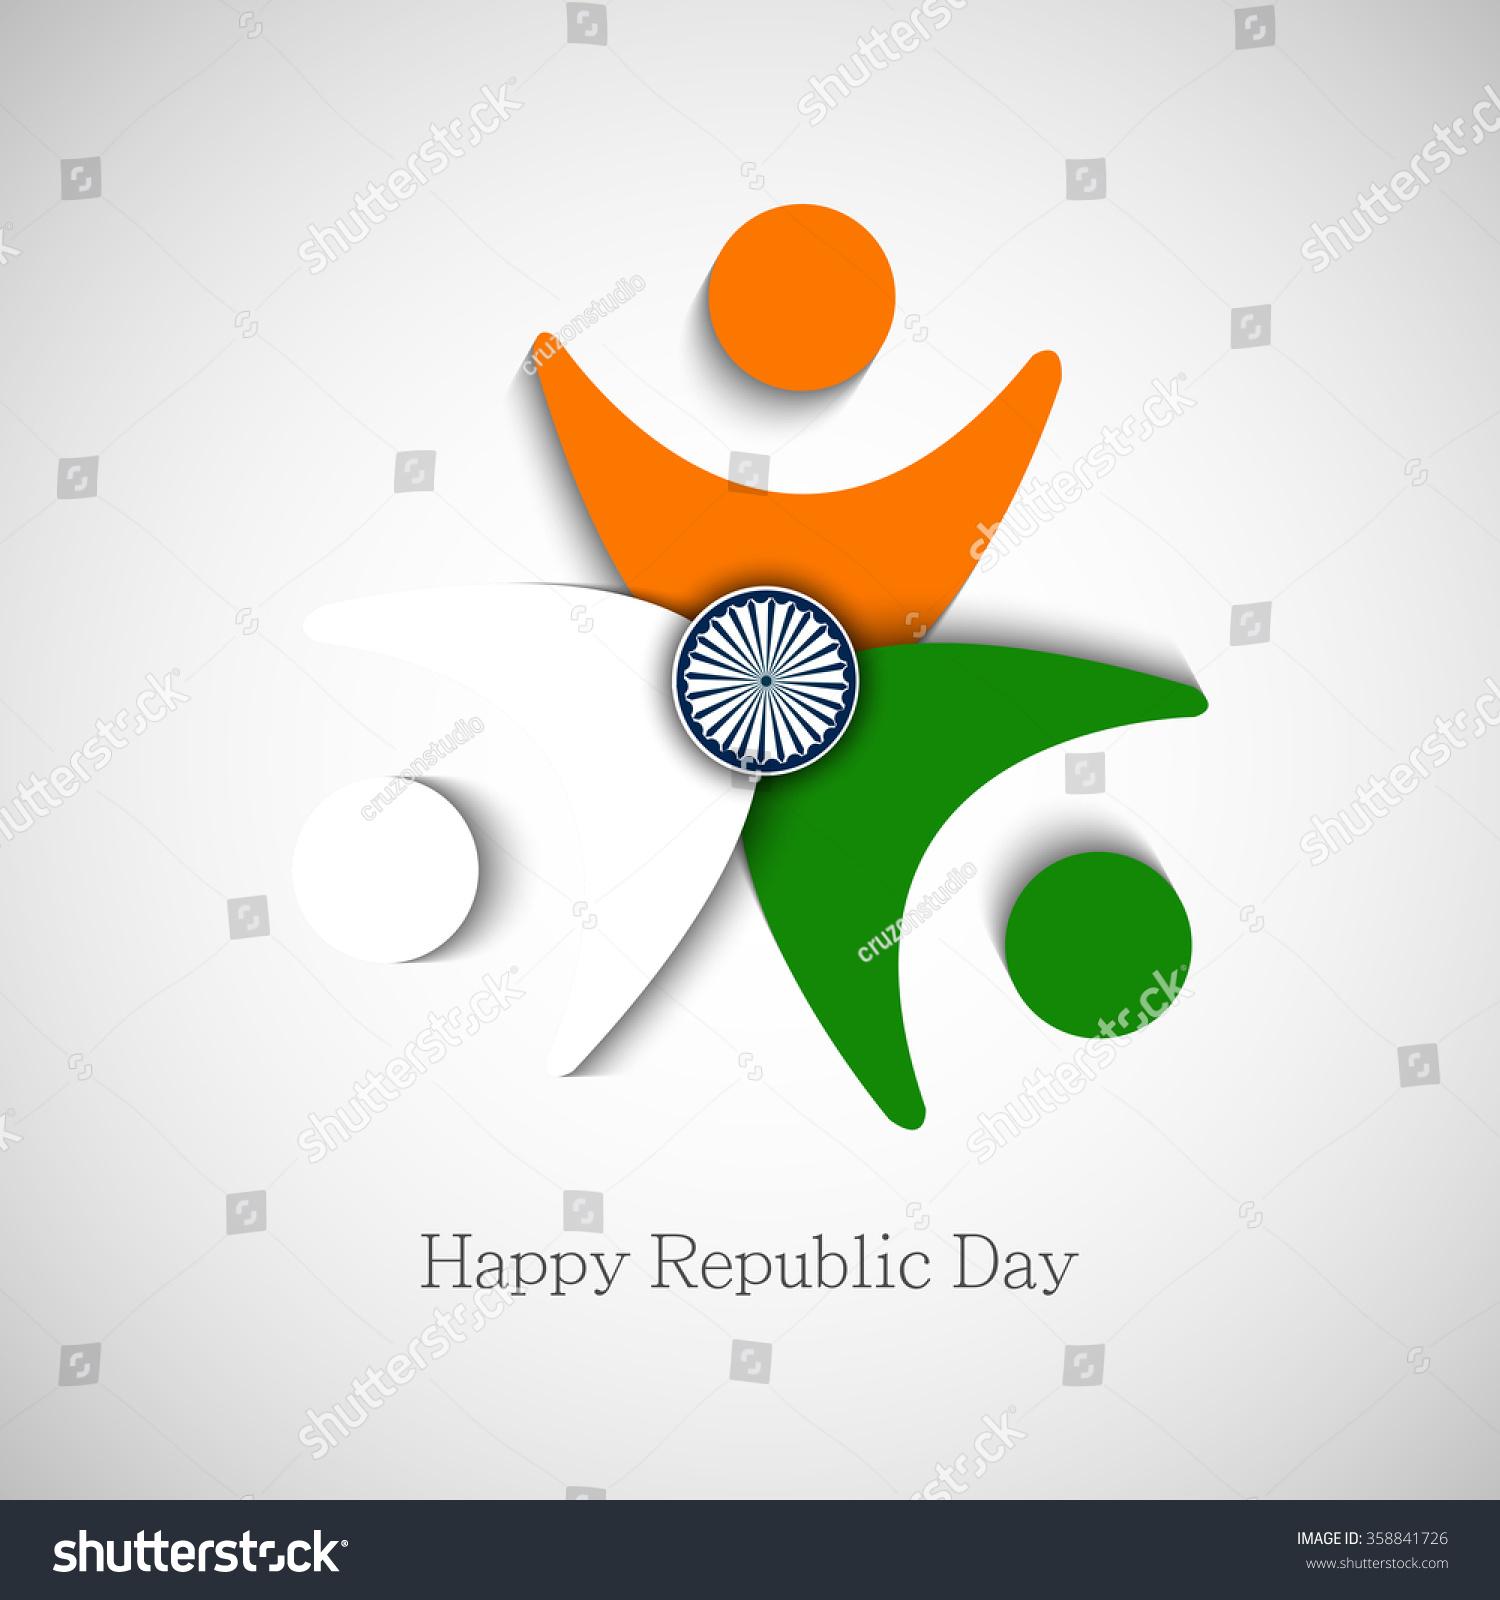 Vector Illustration Greeting Republic Day India Stock Vector